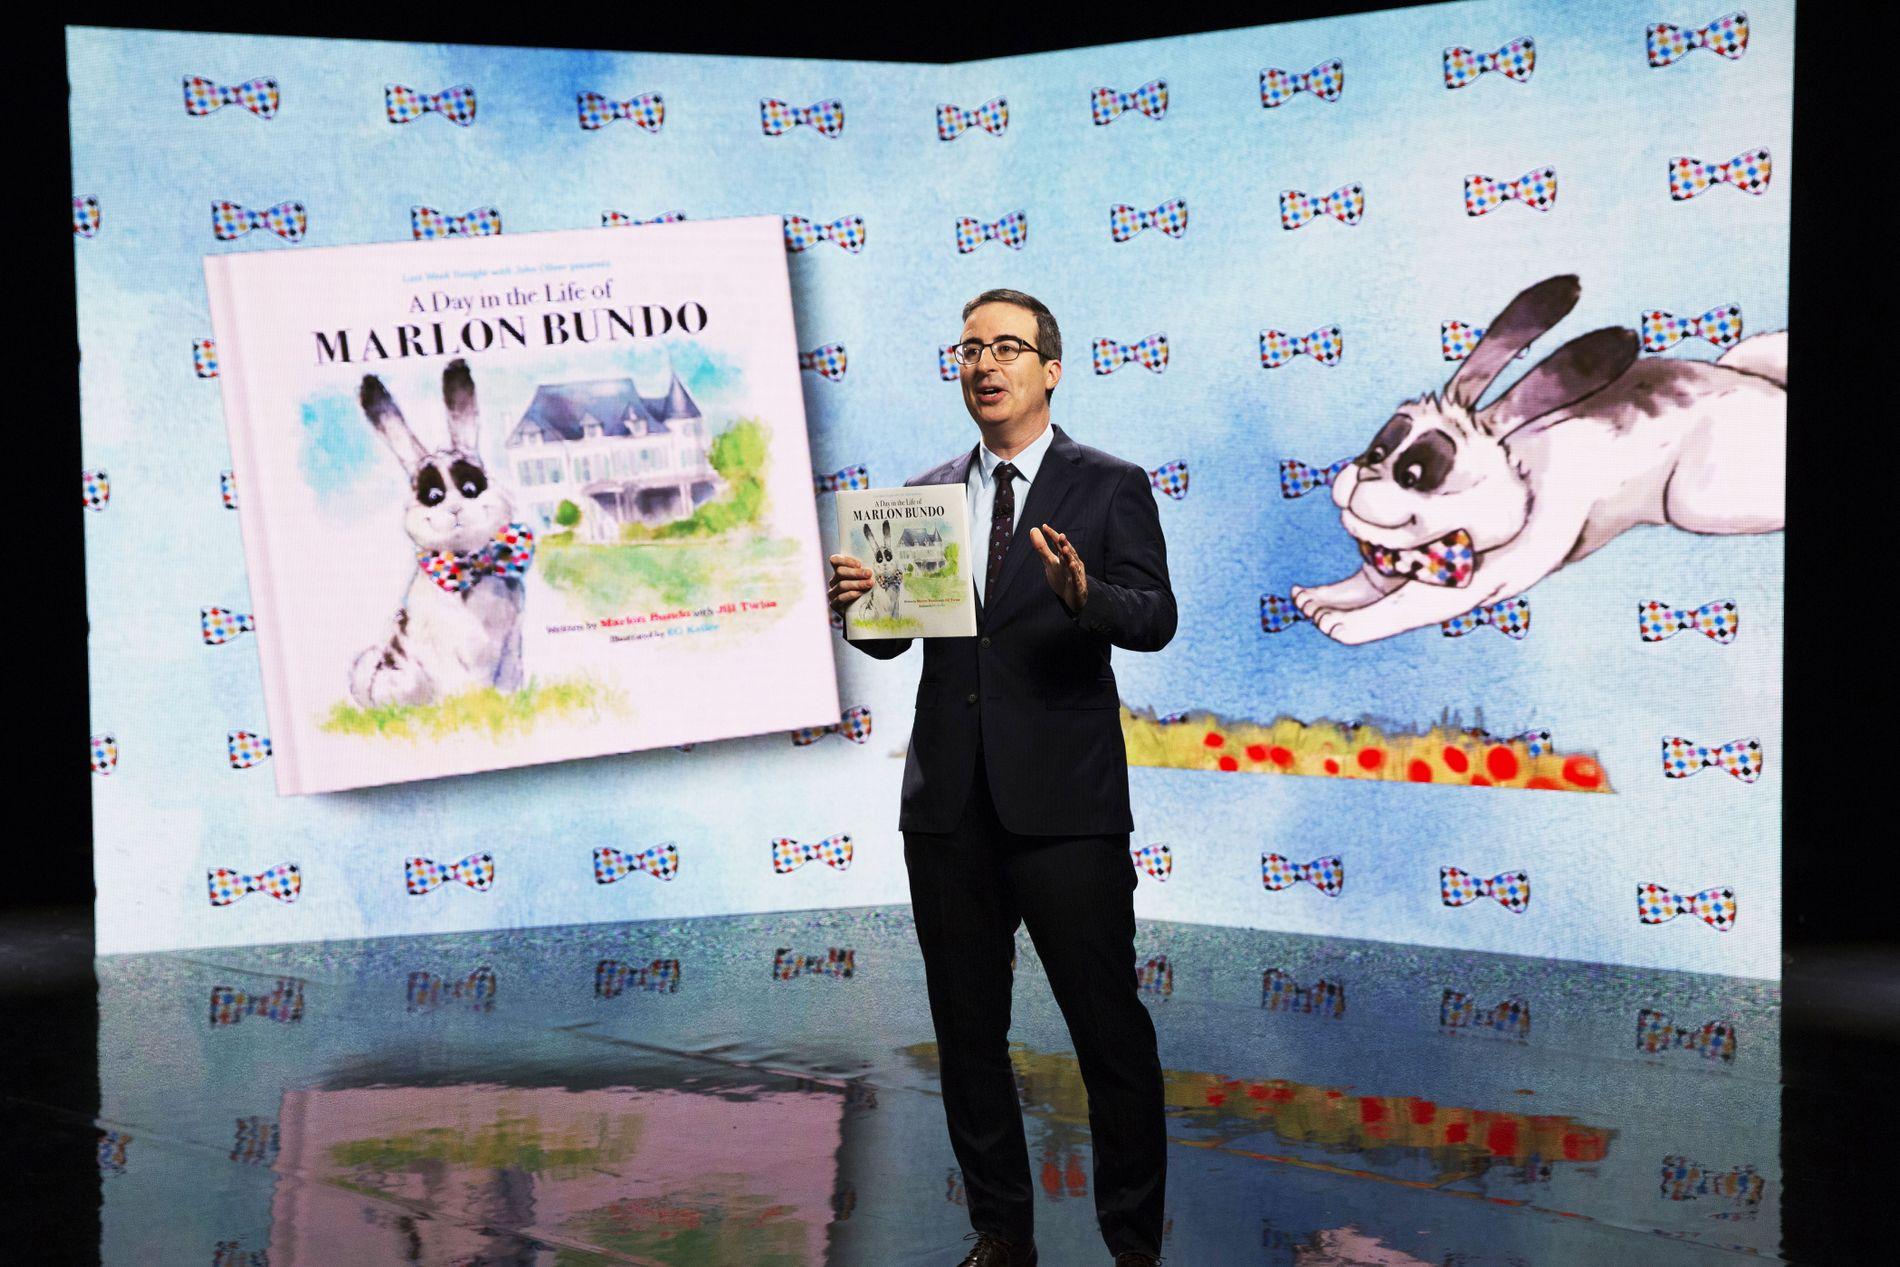 POPULÆR: Komiker John Oliver på en pressekonferanse for barnebboken om homofile Marlon Bundo.